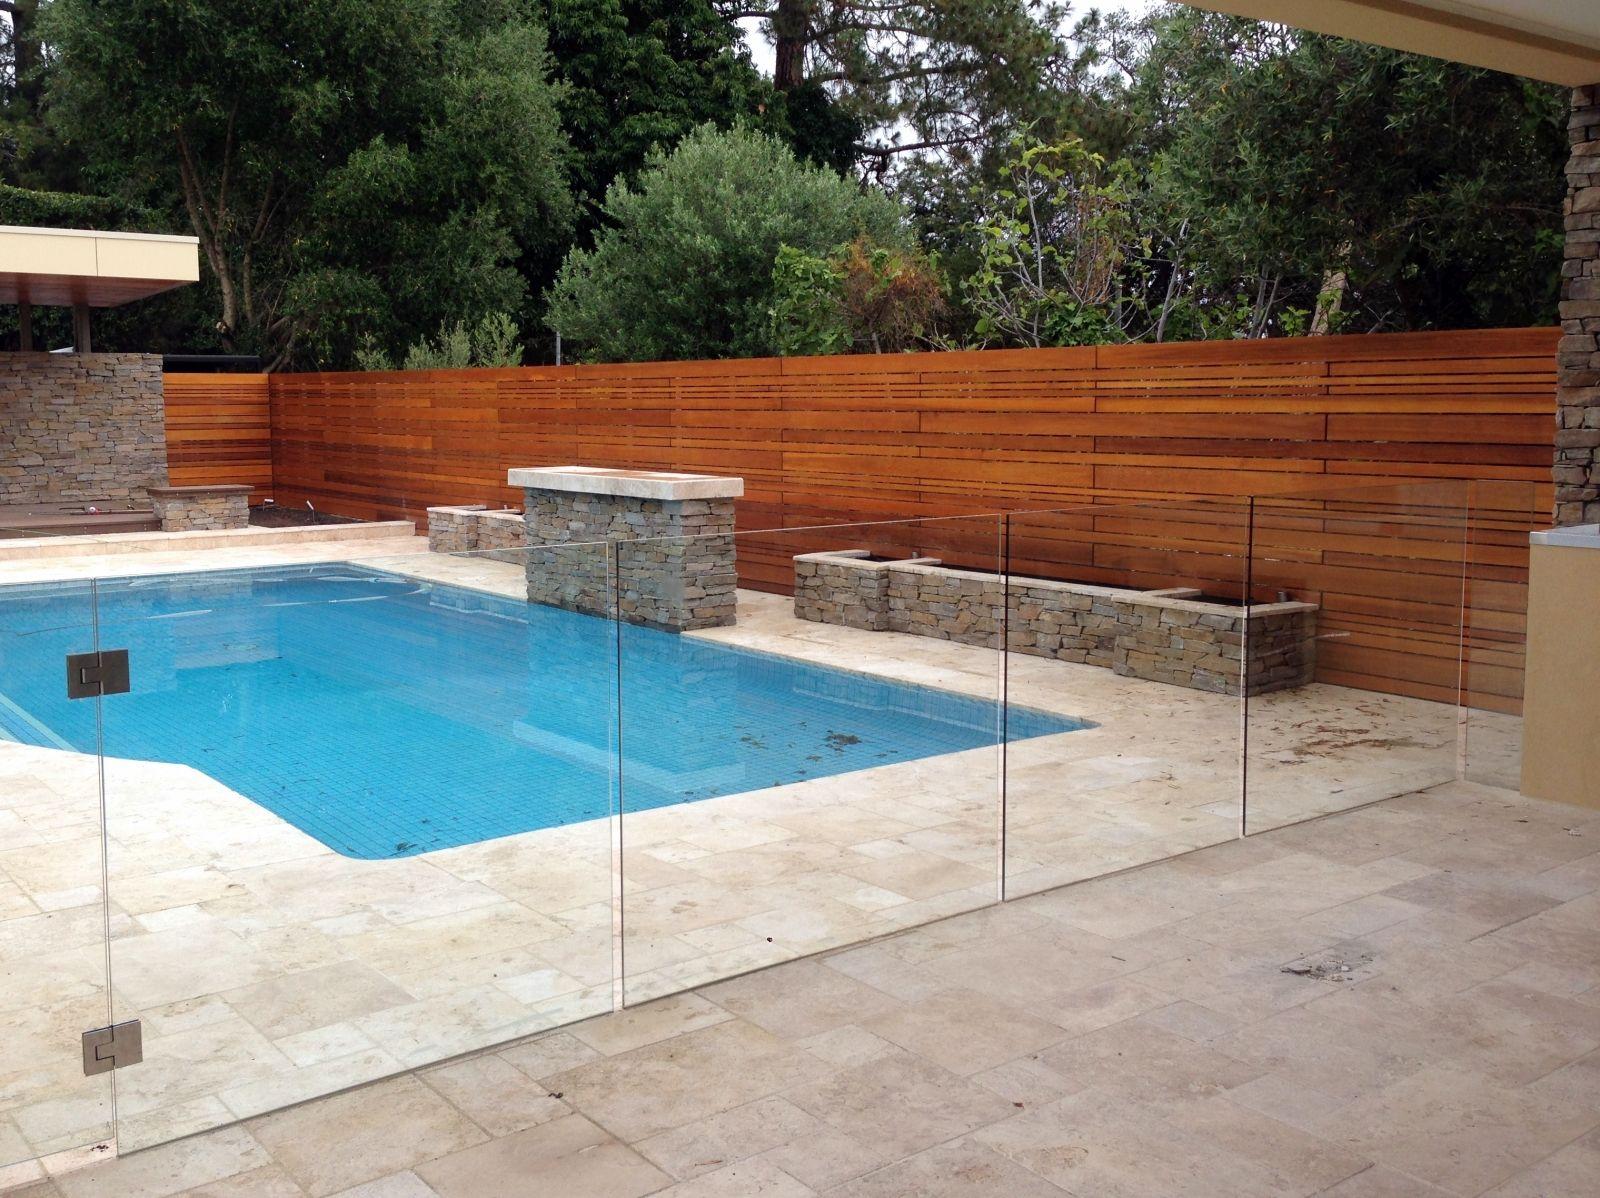 Pin By Lea On Glass Pool Fencing Backyard Pool Pool Fence Glass Pool Fencing